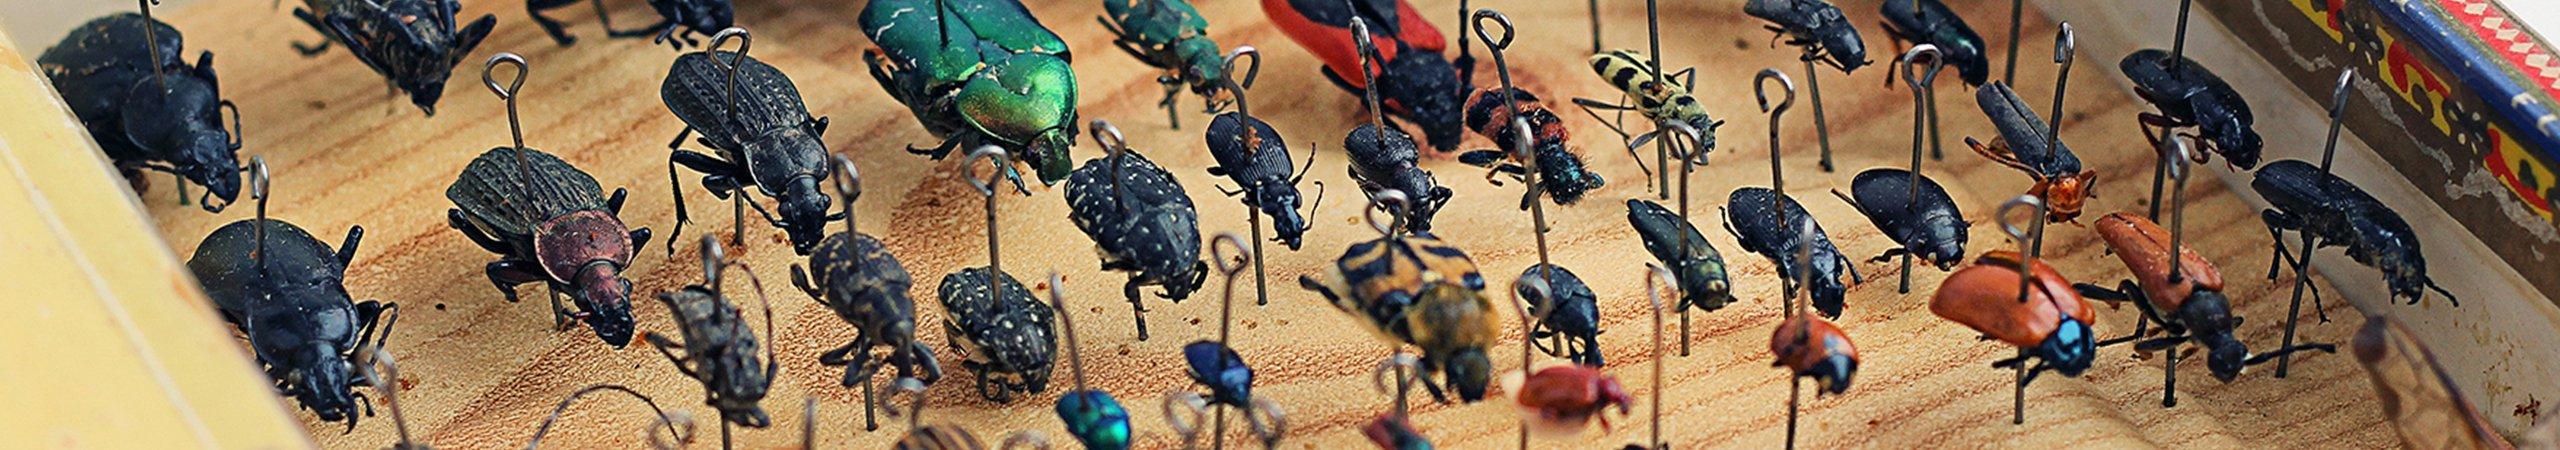 bugs on display